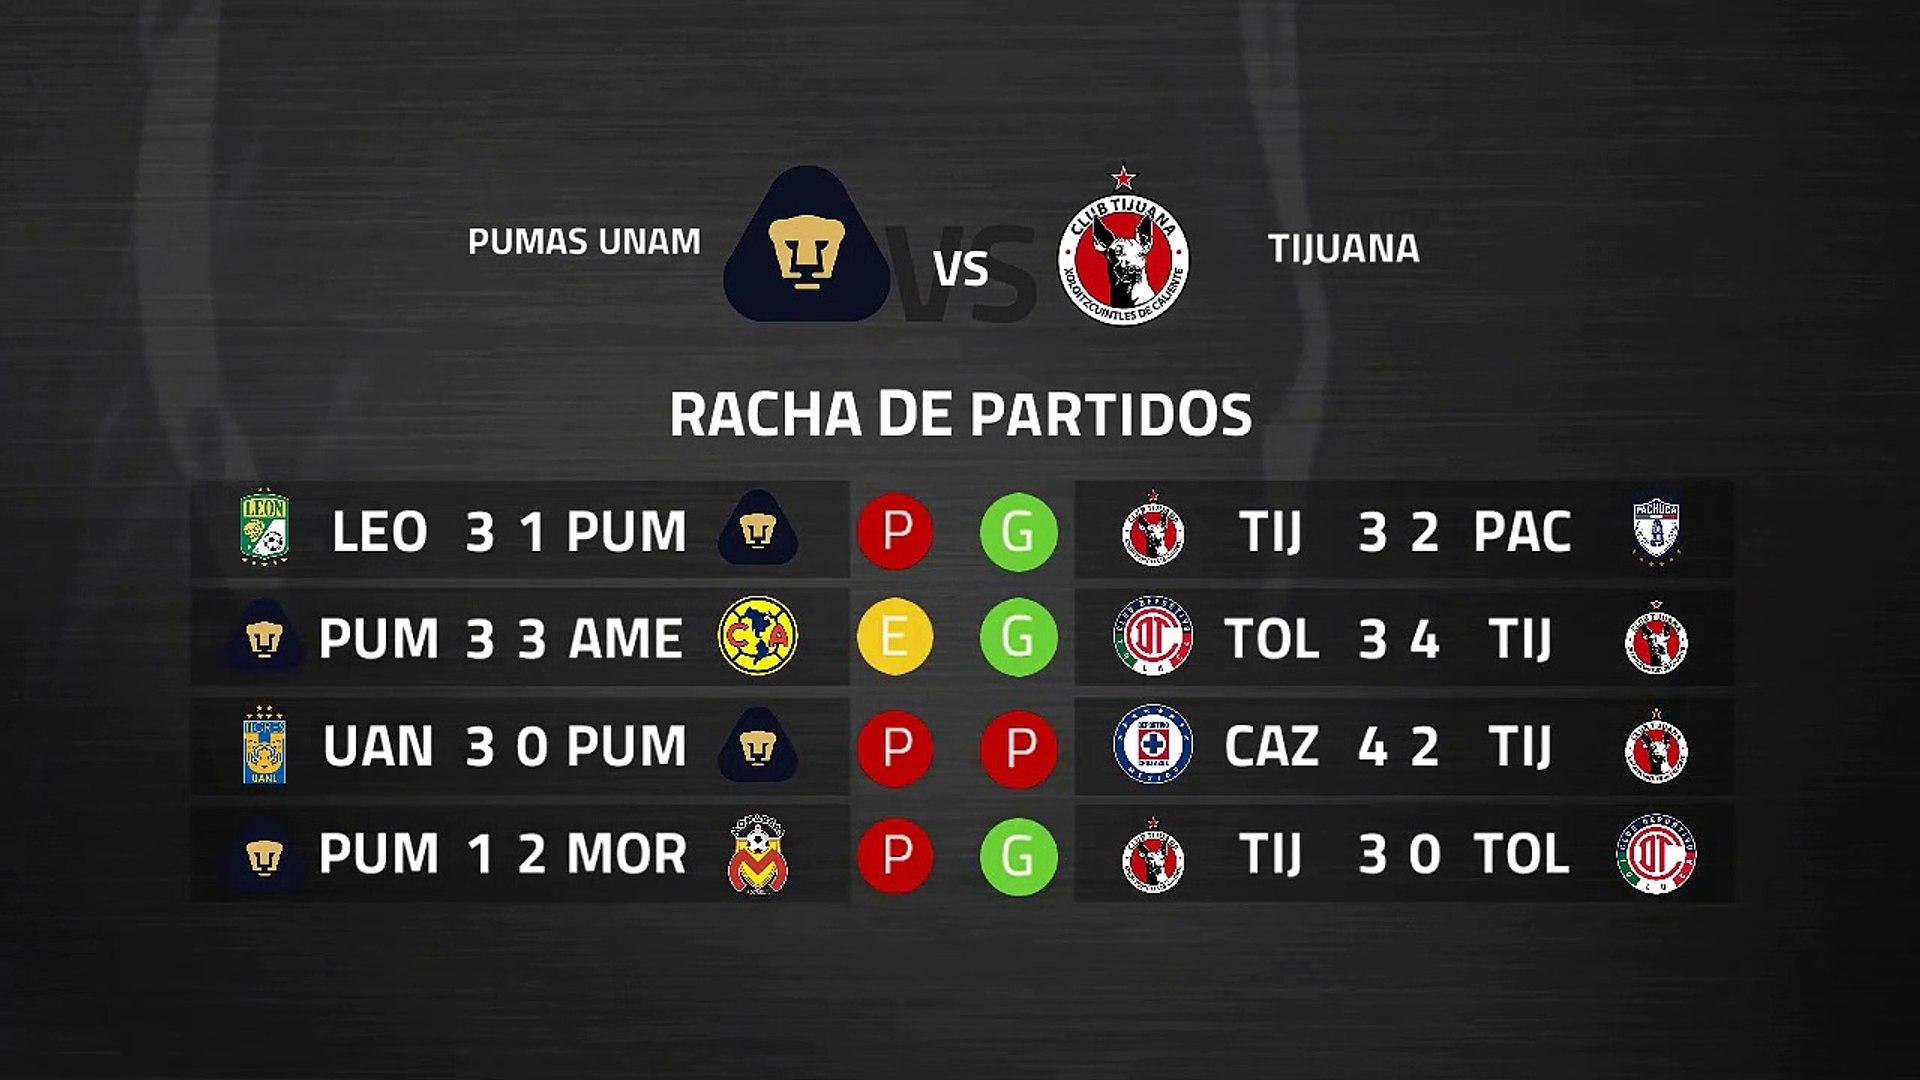 Previa partido entre Pumas UNAM y Tijuana Jornada 11 Liga MX - Clausura